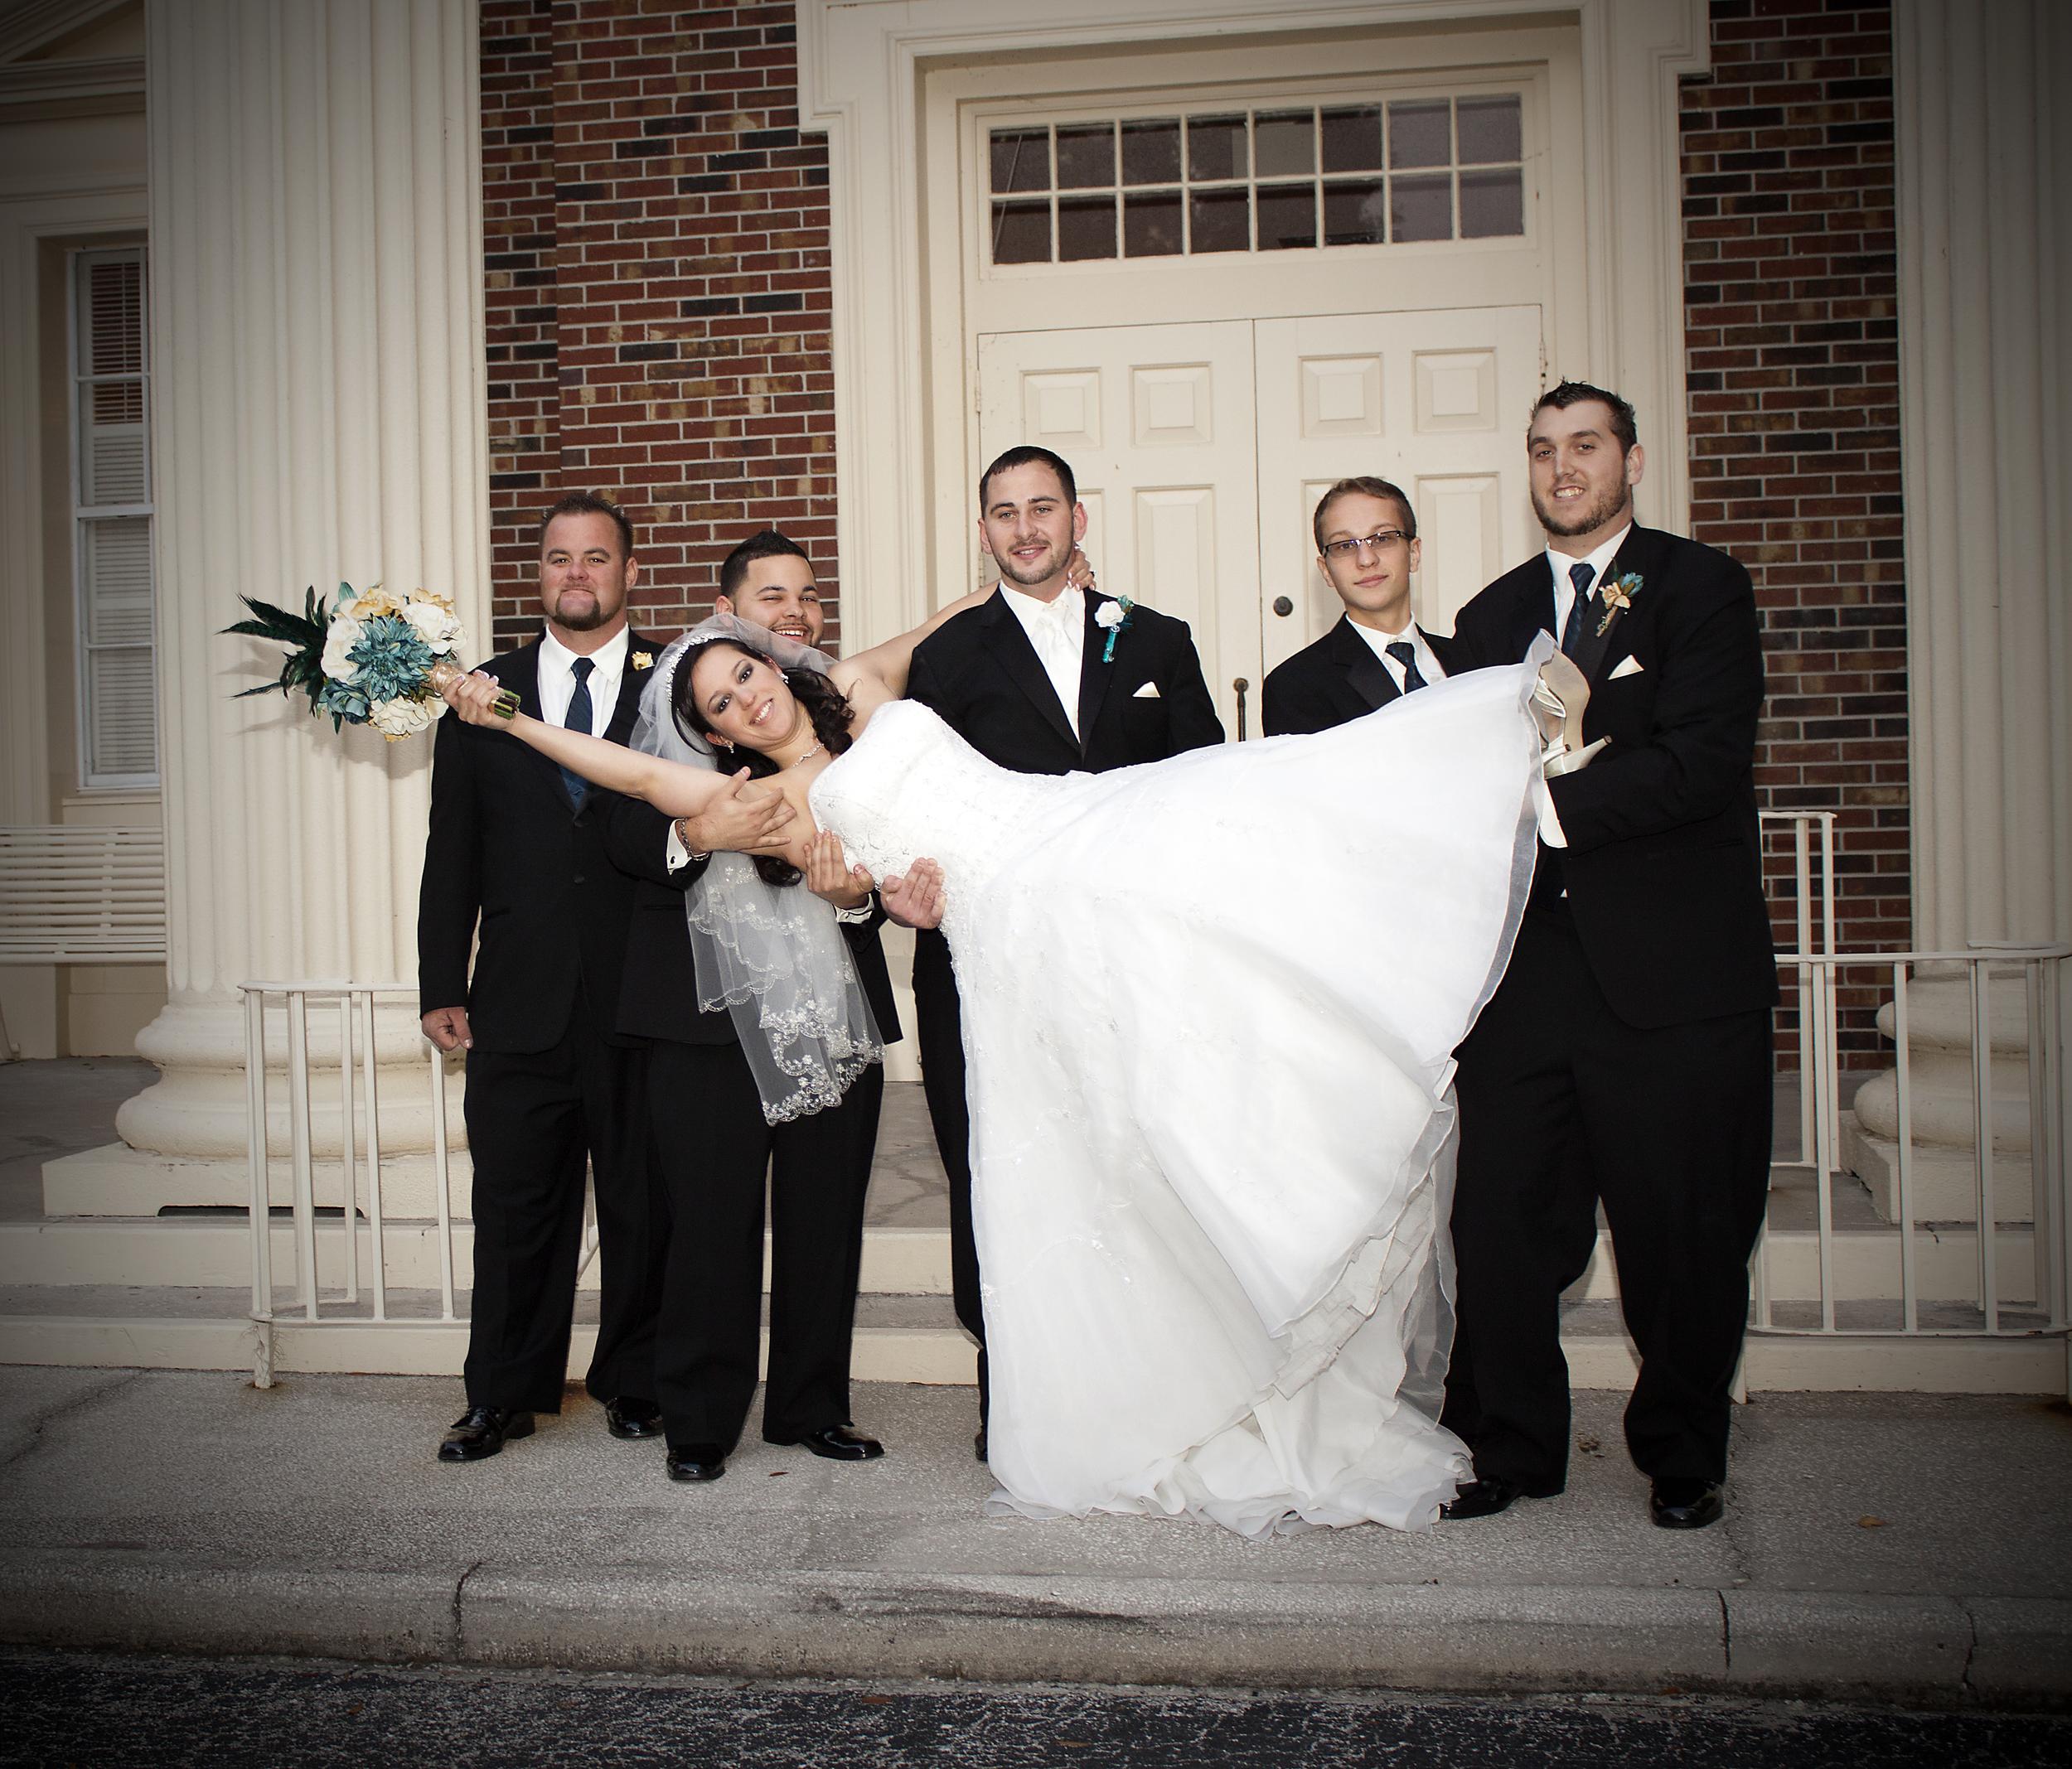 naomi and jack wedding 267.jpg